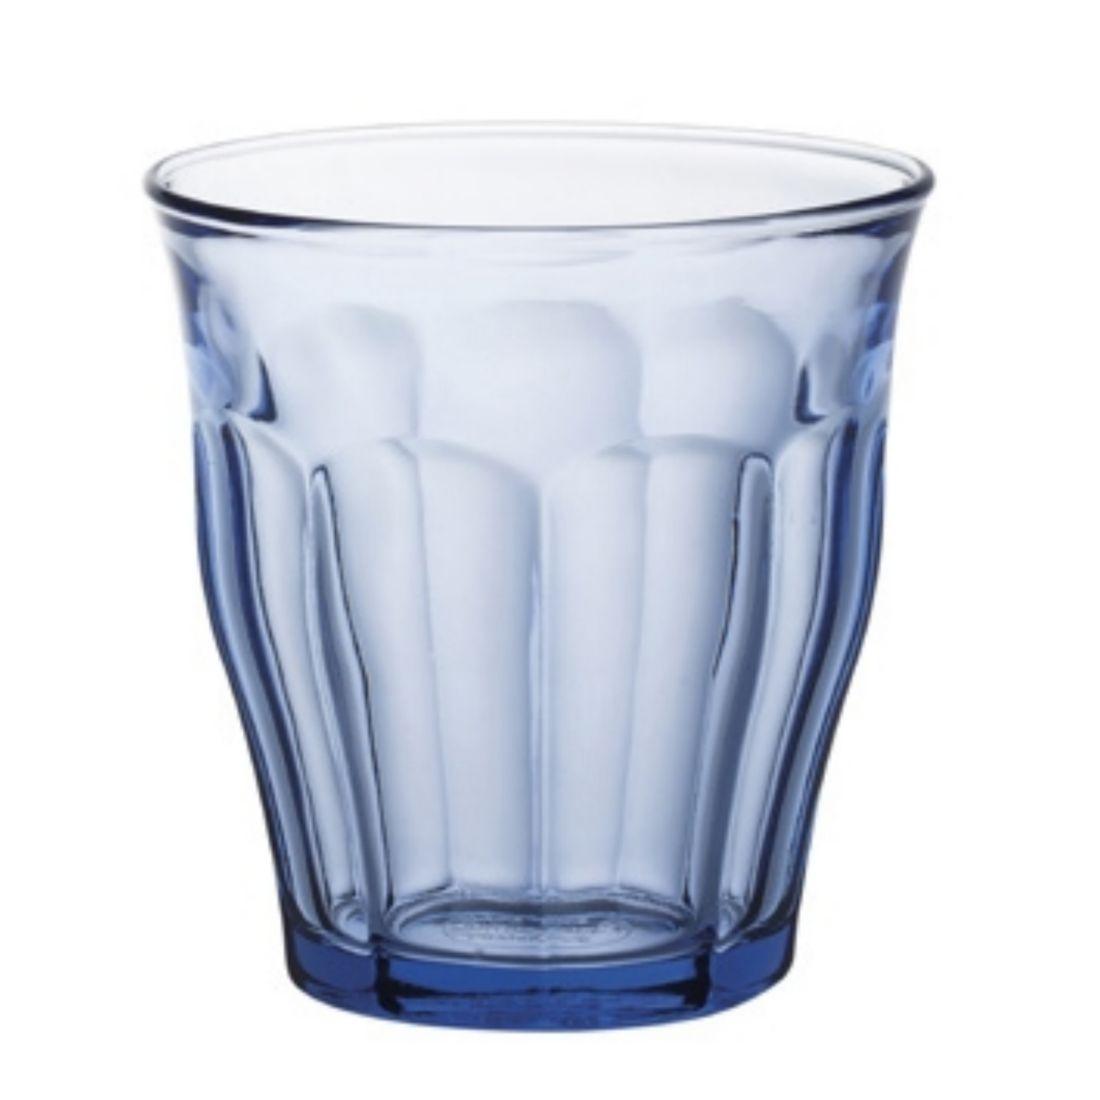 DURALEX | sklenice, Duritka Picardie, modrá, objem - 22 cl